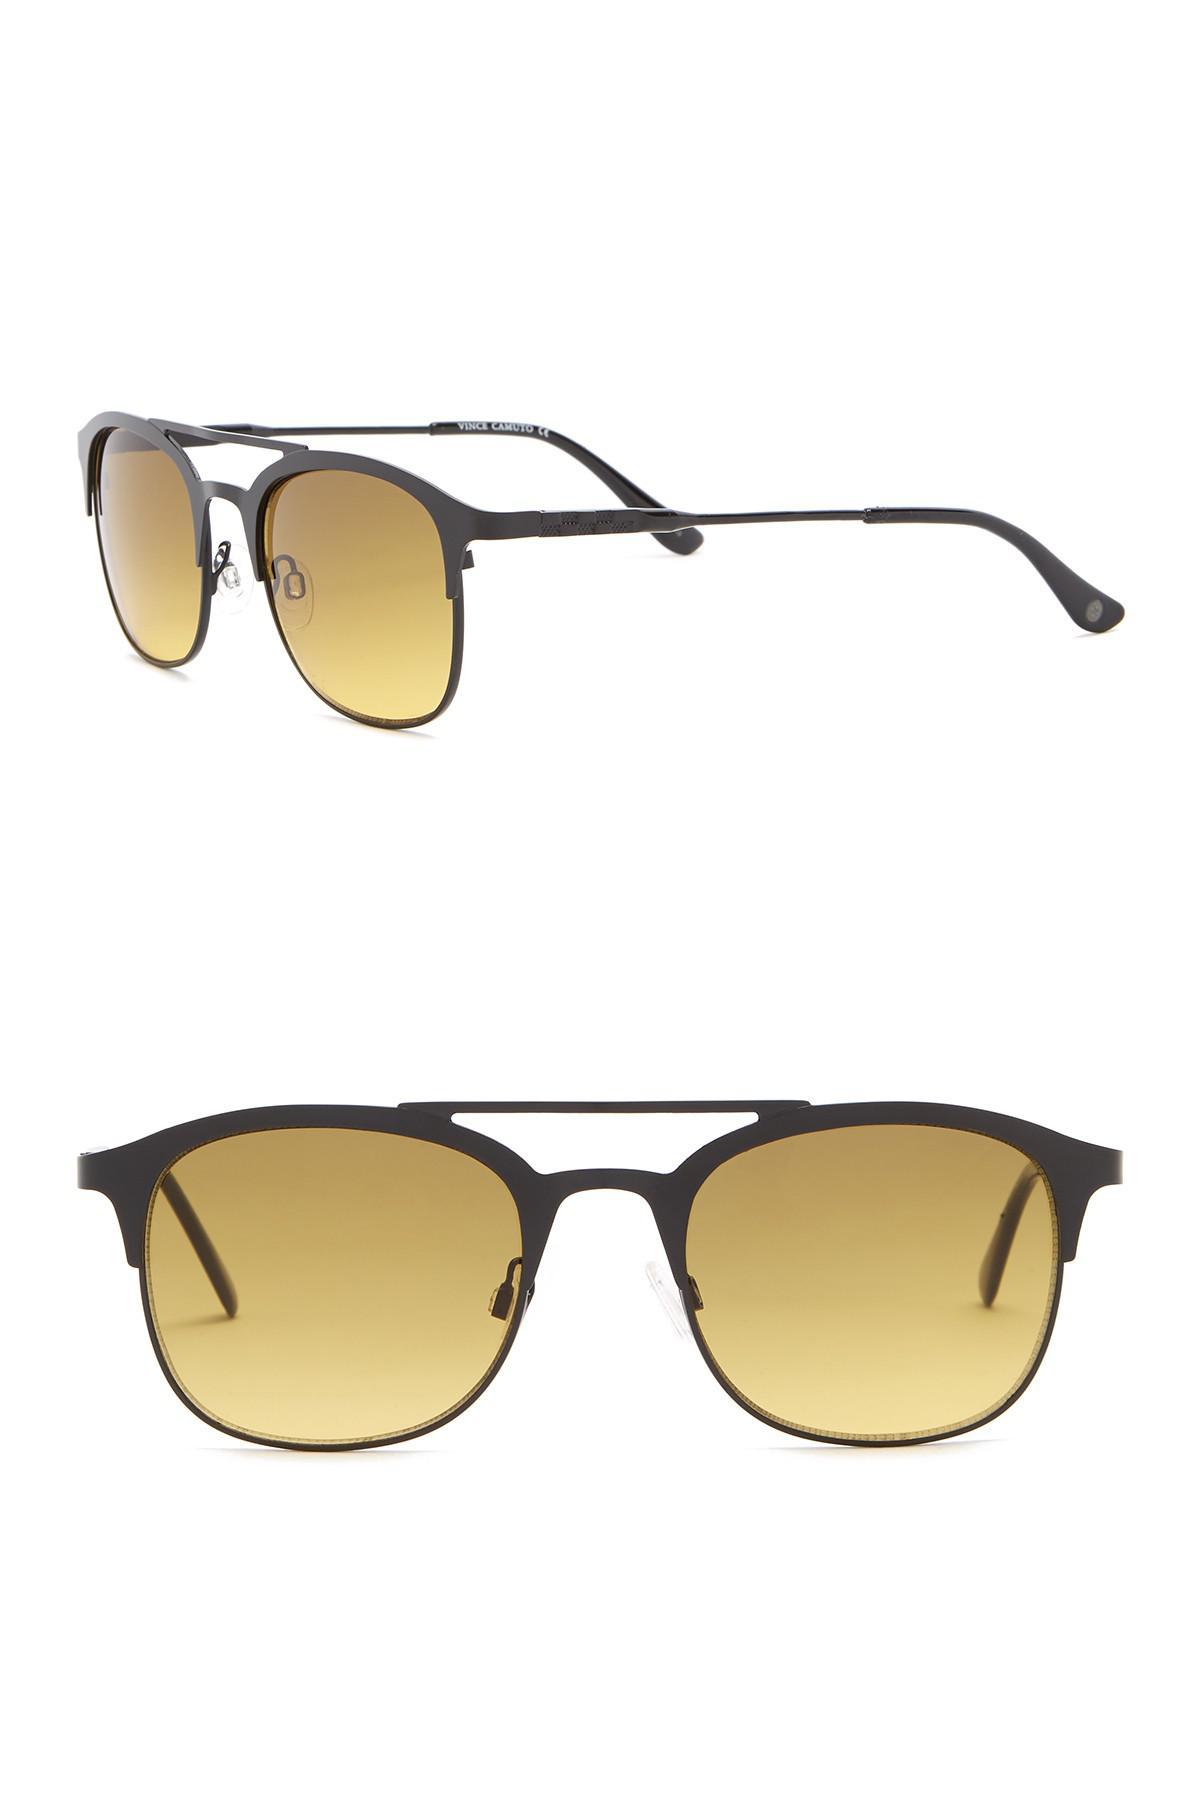 6728b4c71 Vince Camuto Retro Clubmaster Sunglasses for Men - Lyst